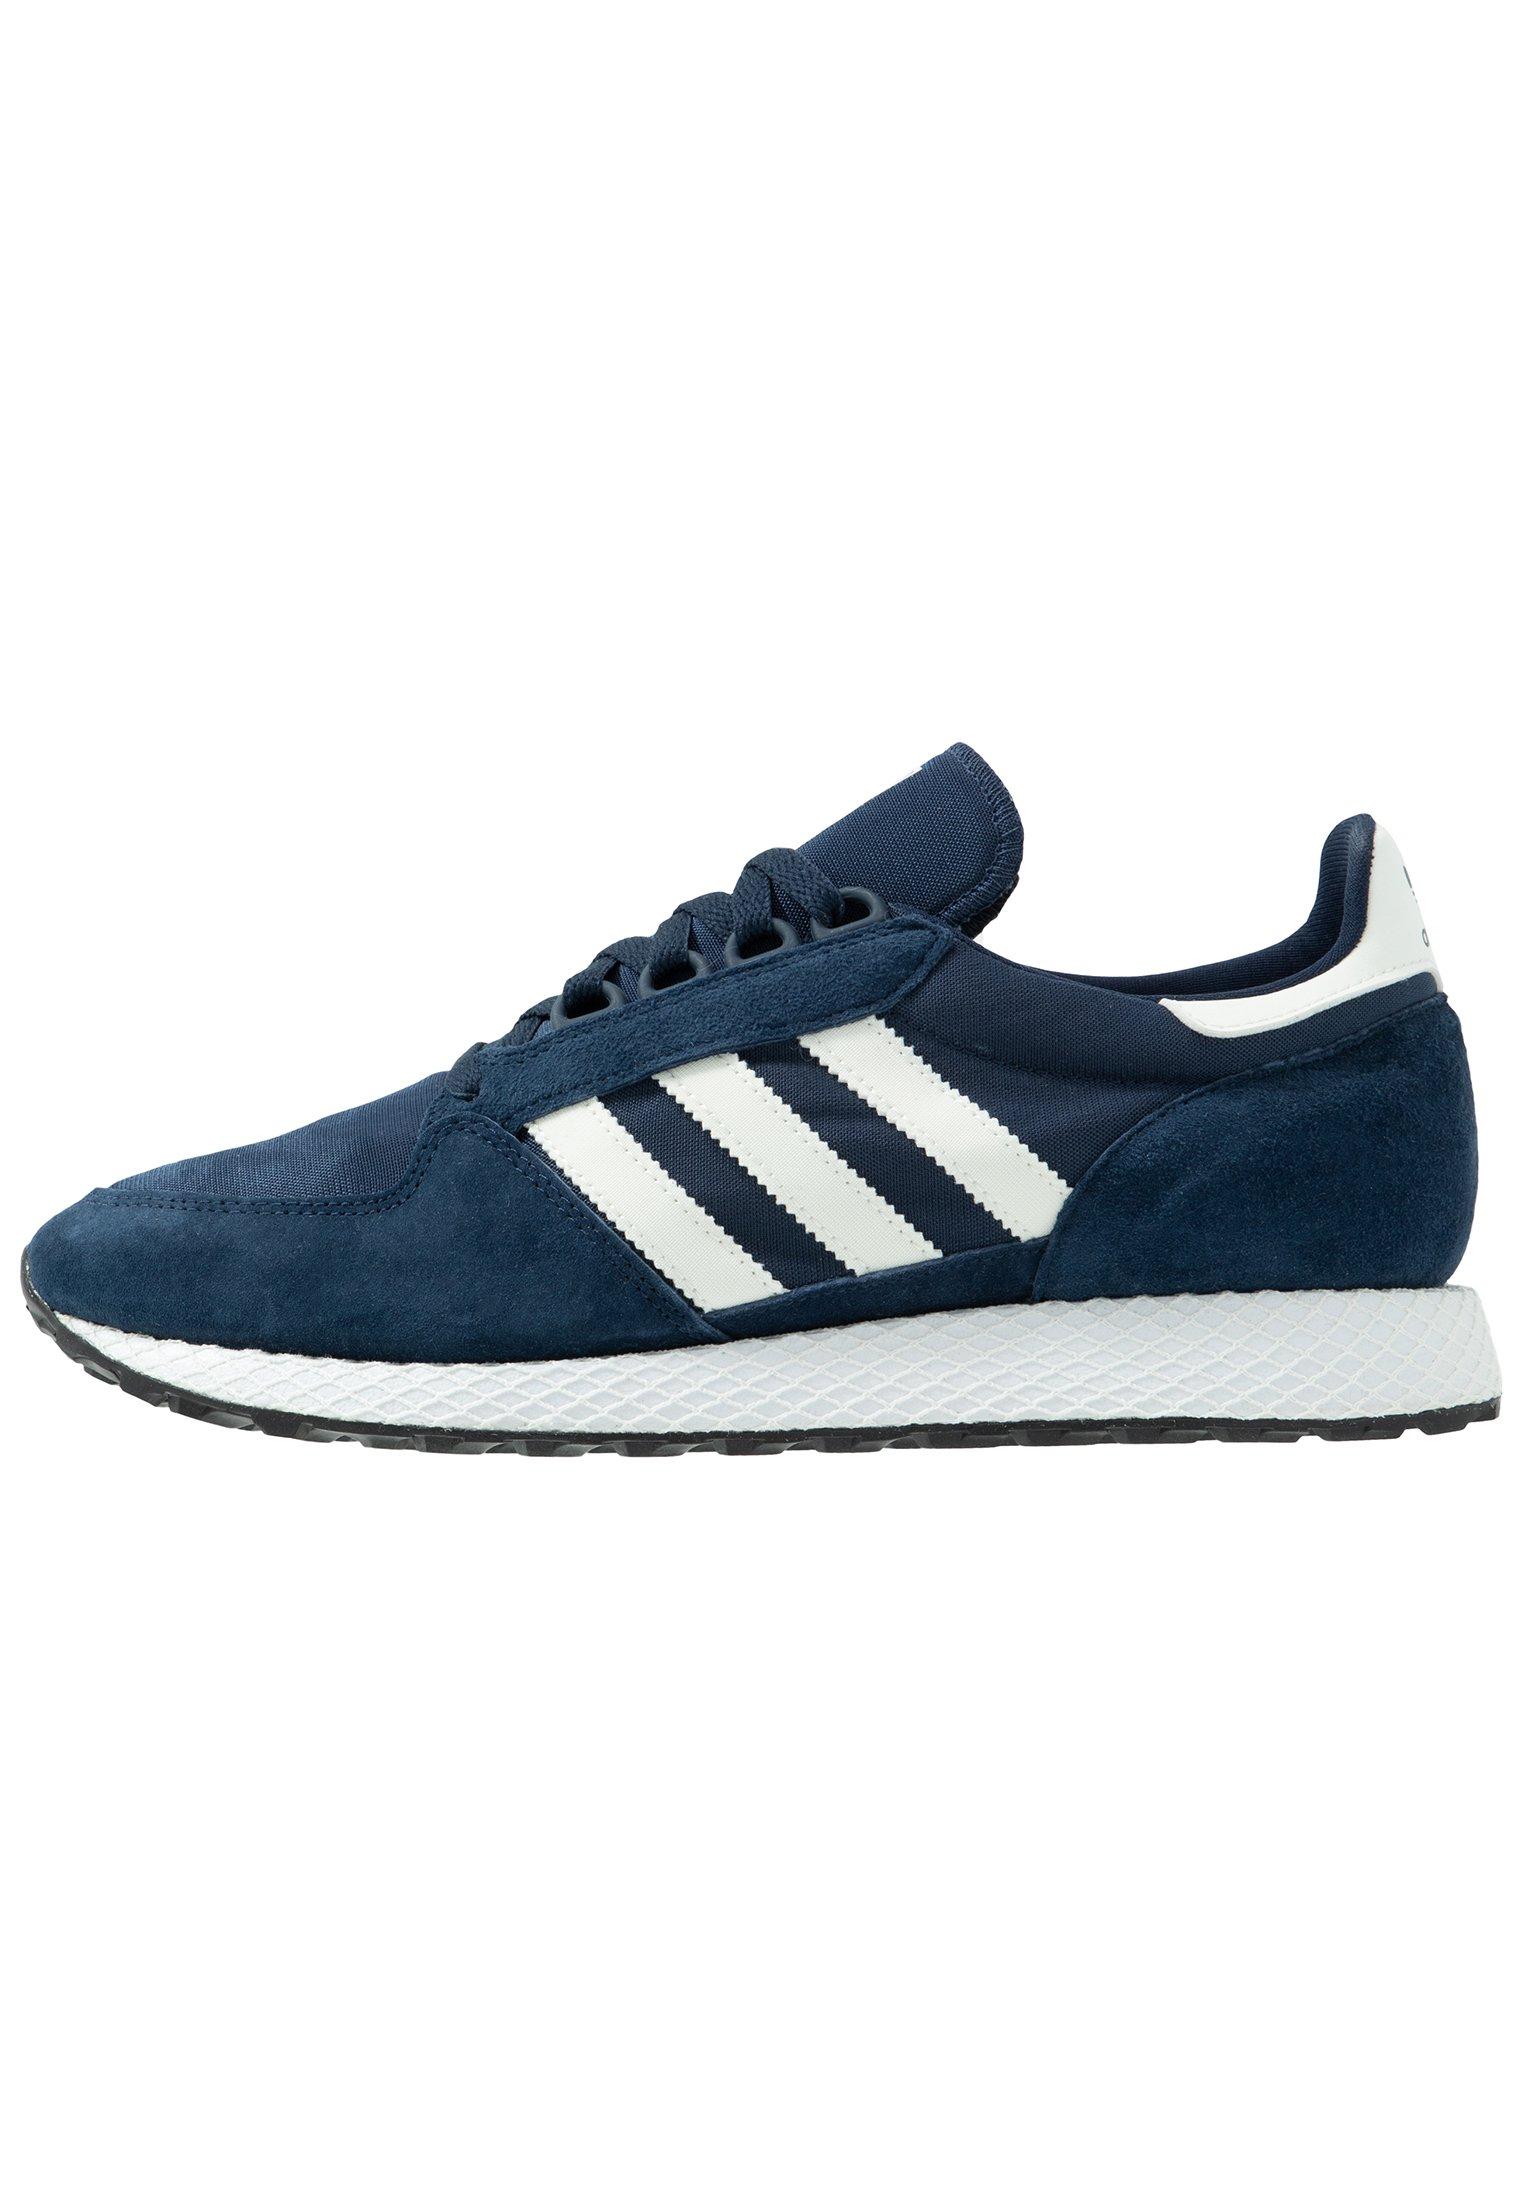 forest grove sneaker low adidas blau